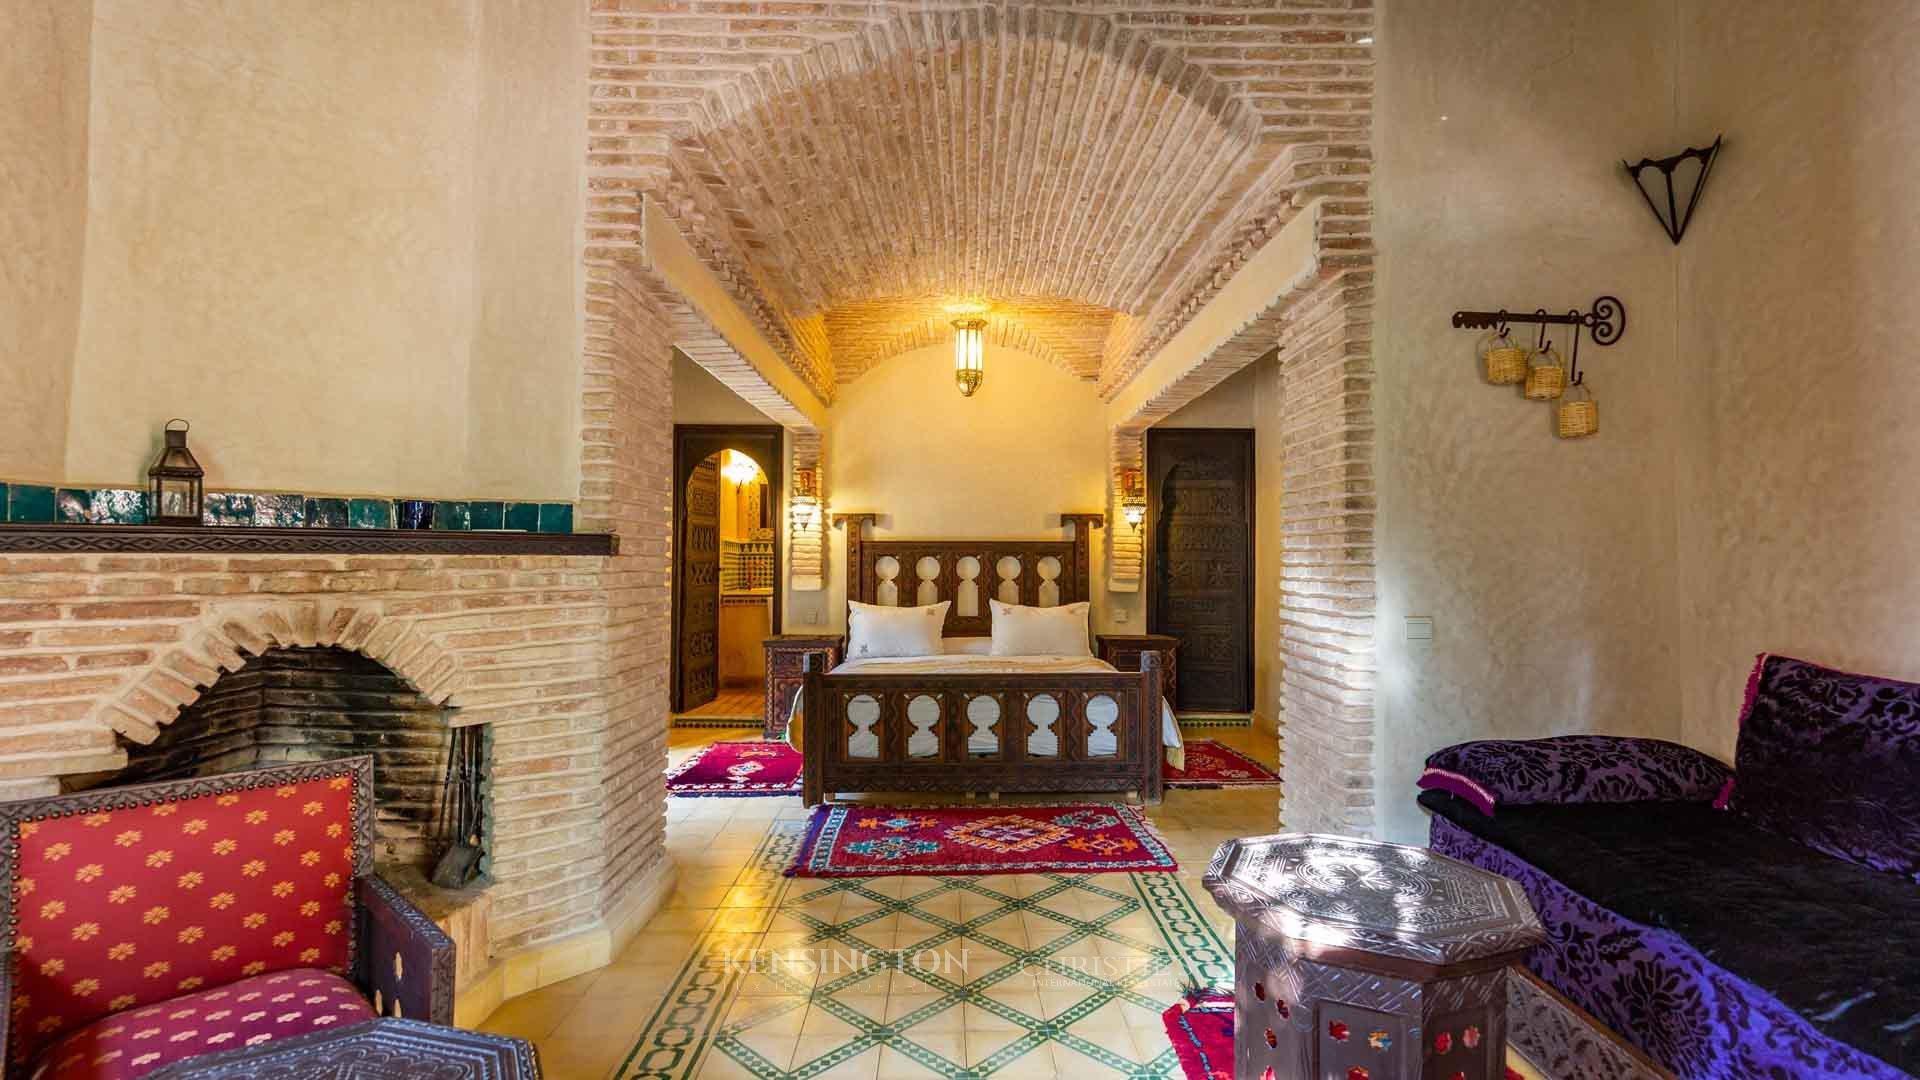 KPPM01025: Riad Veronica Riad Taroudant Morocco